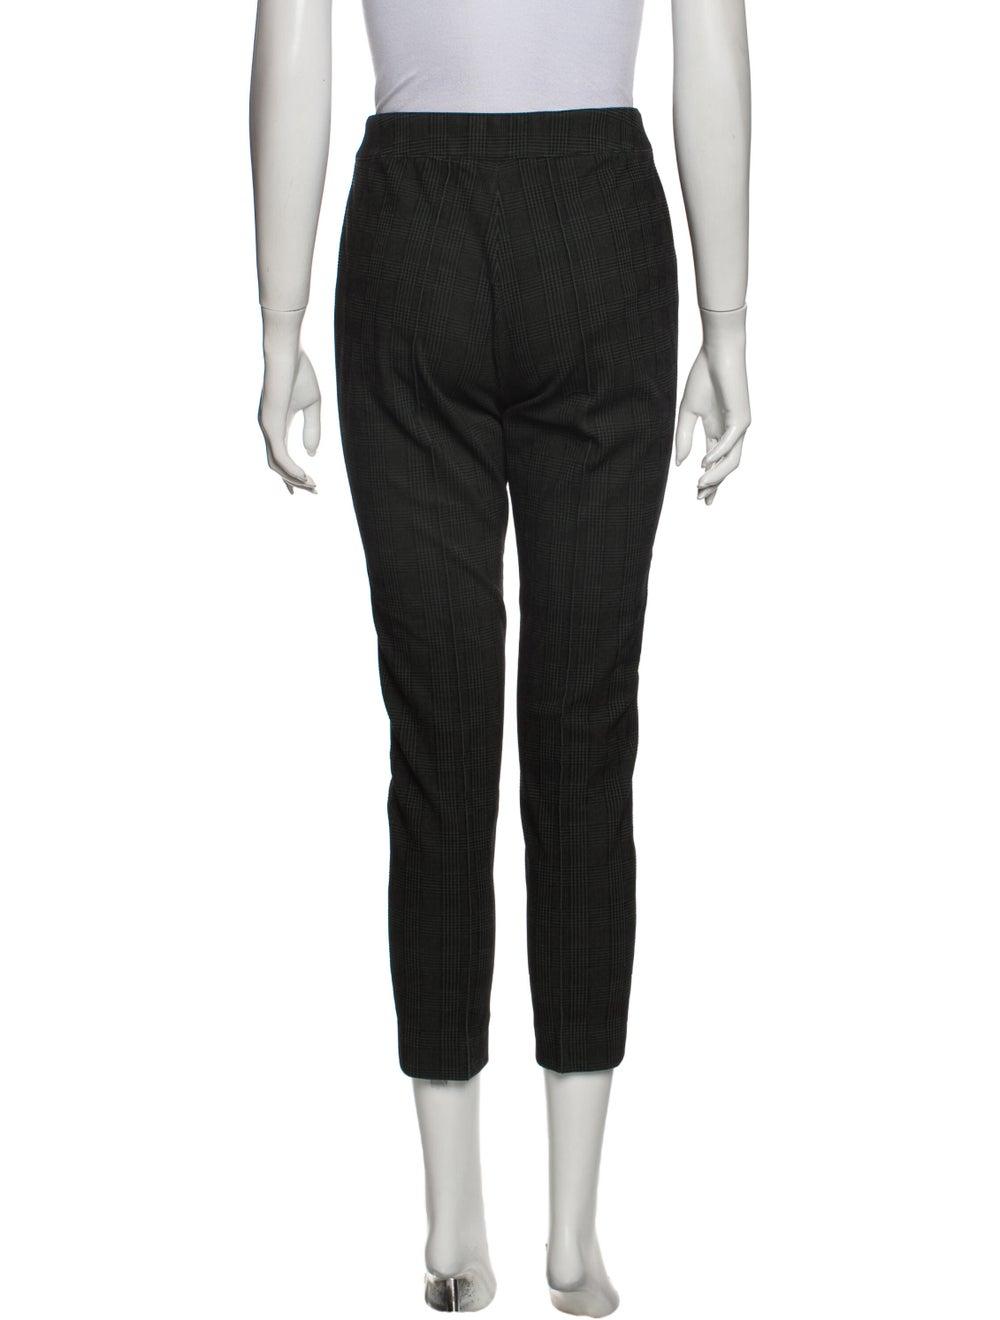 Akris Punto Plaid Print Skinny Leg Pants Green - image 3